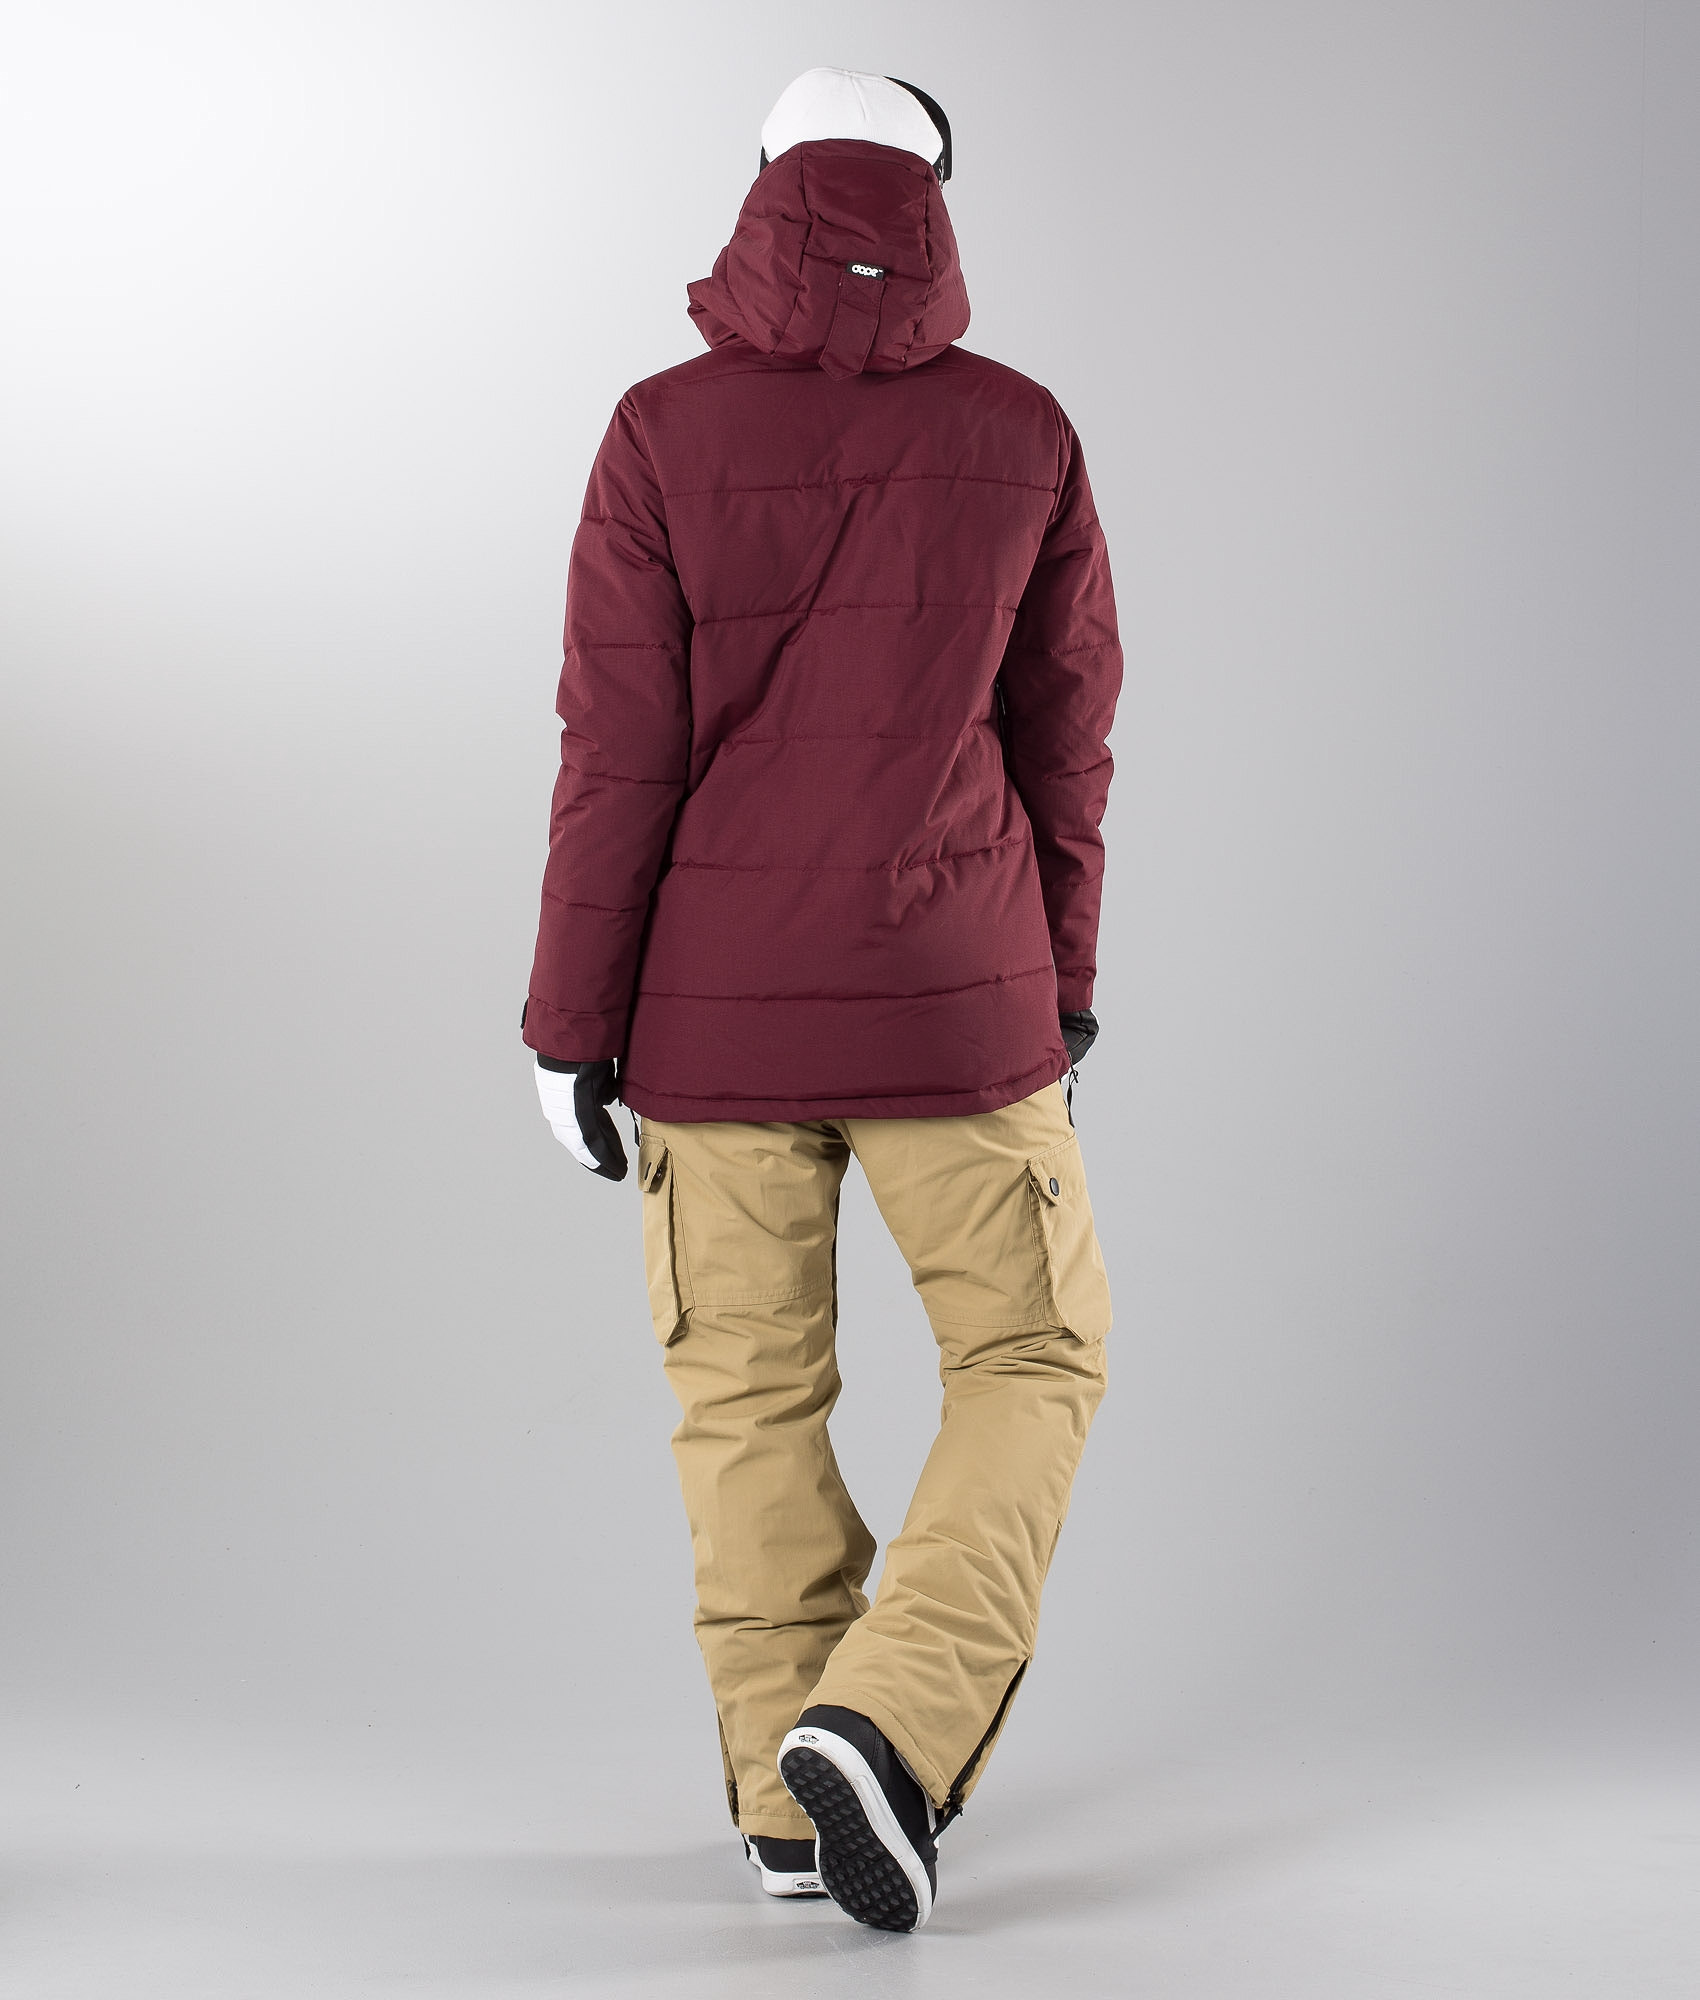 f5efe4bdacb0 Dope Puffer W Snowboard Jacket Burgundy - Ridestore.com